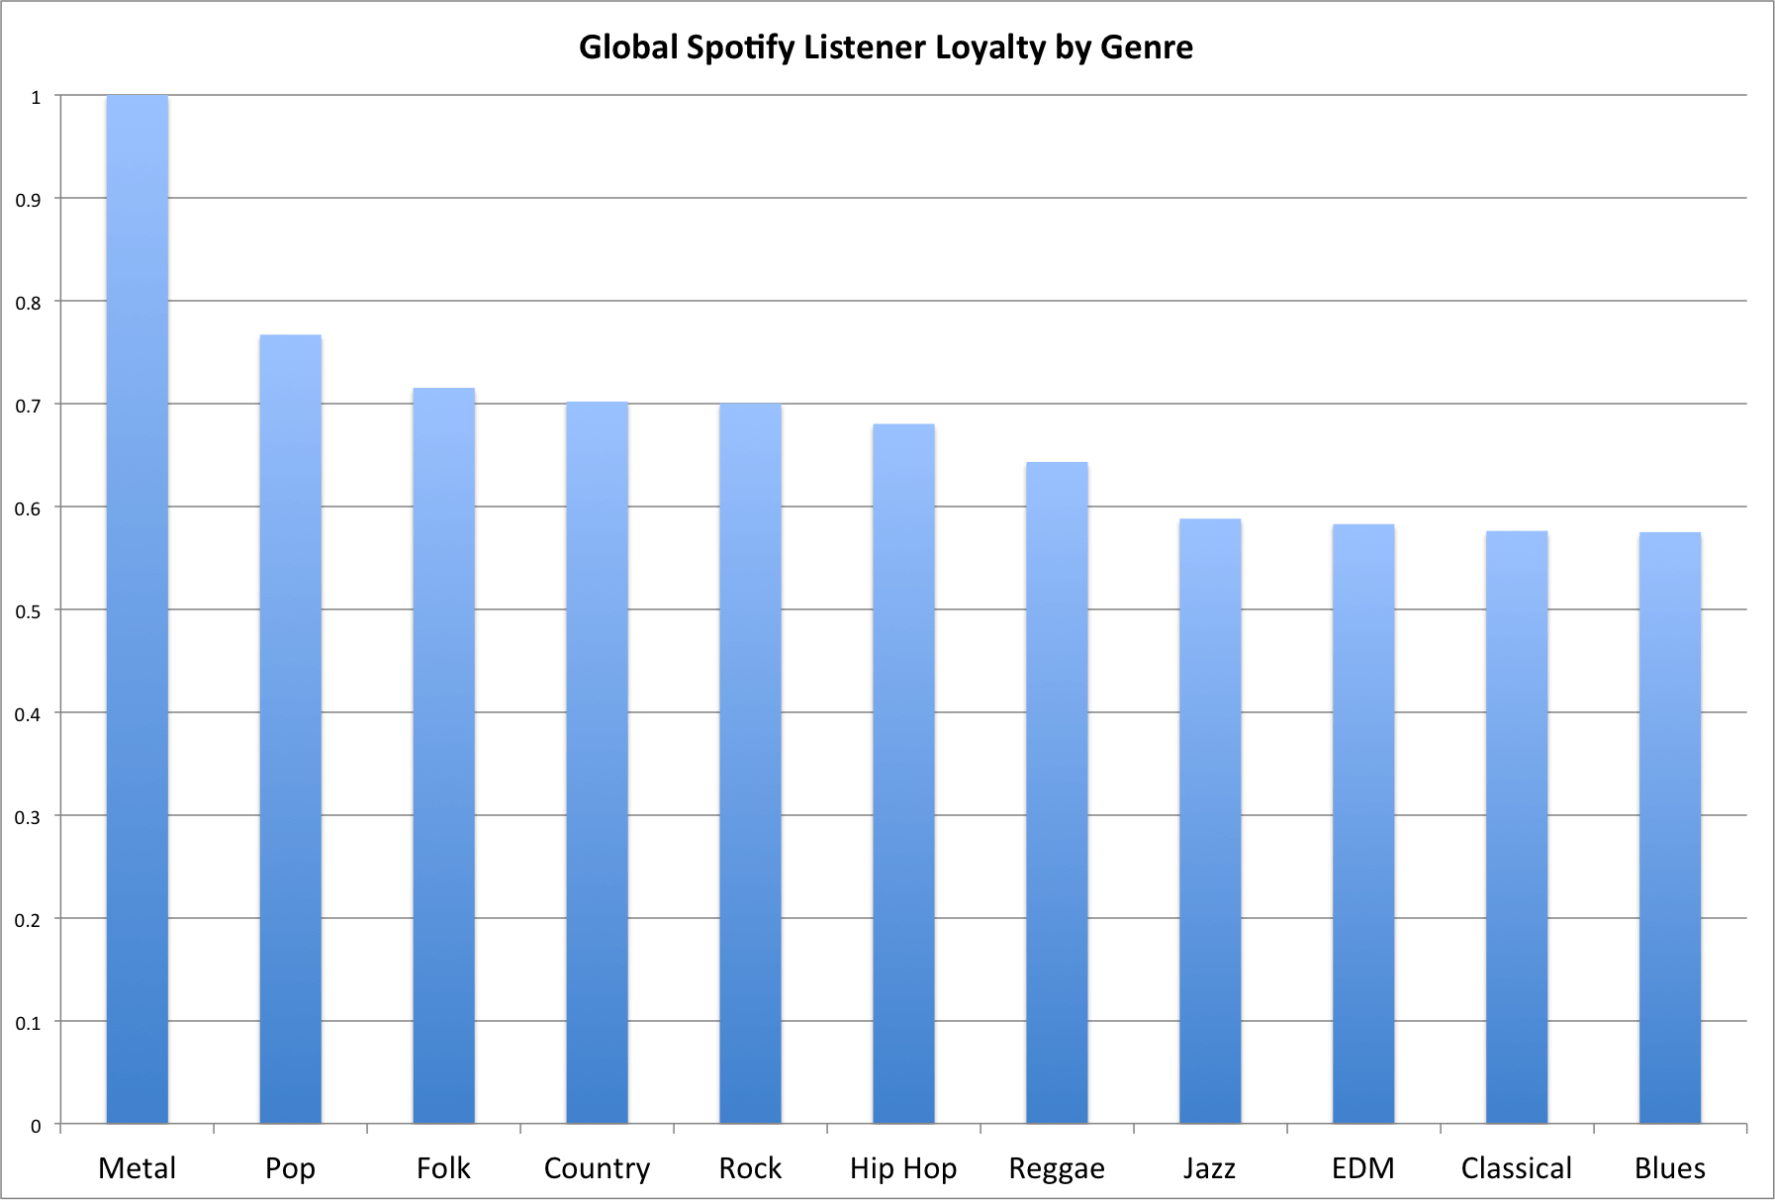 Spotify Metal Fans Sind In Sachen Genre Loyalitat Fuhrend Dabei